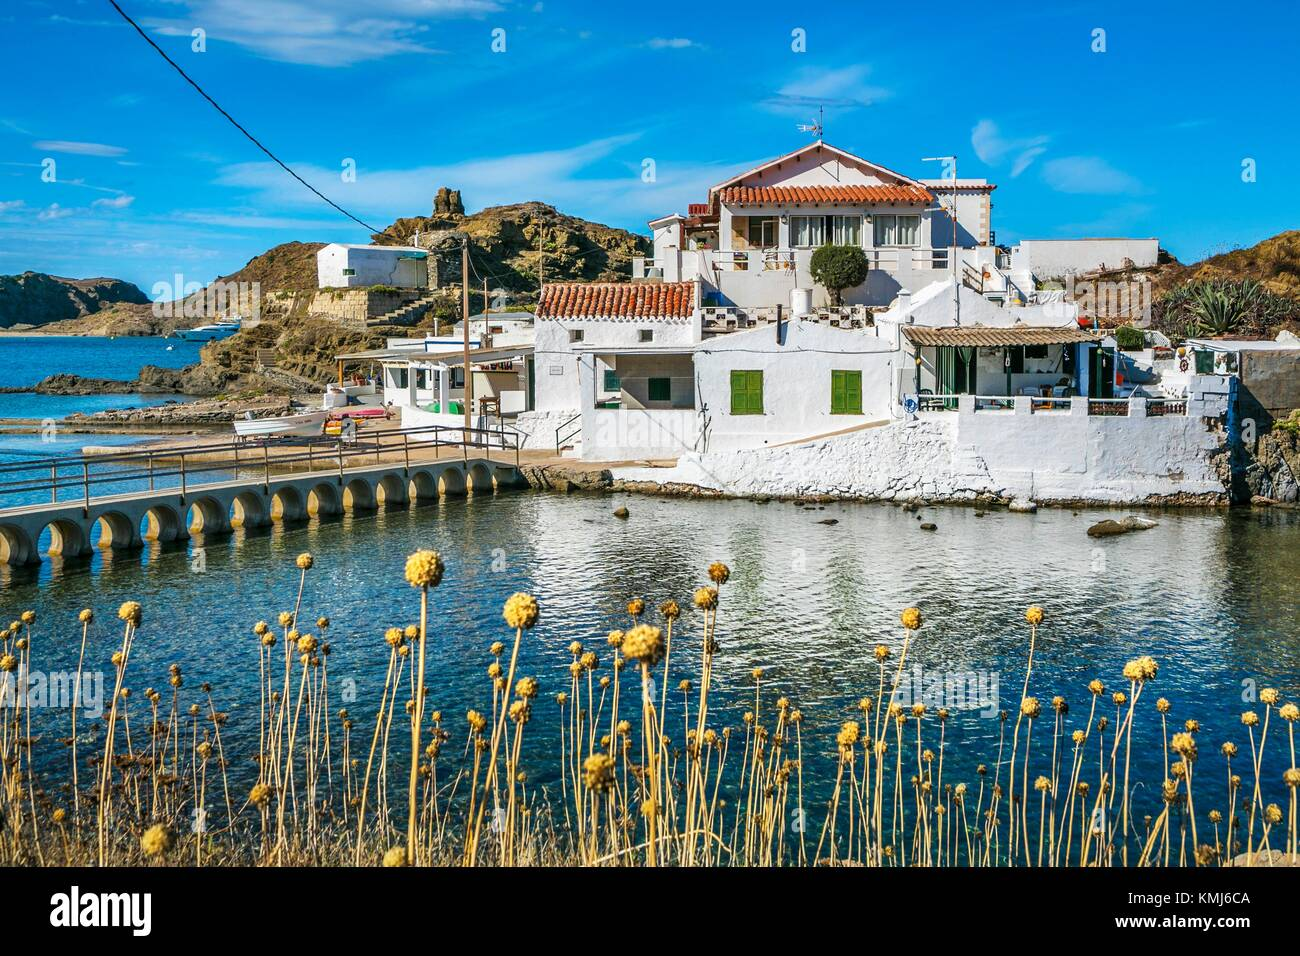 Sa Mesquida. Mao Municipality. Minorca. Balearic Islands. Spain - Stock Image